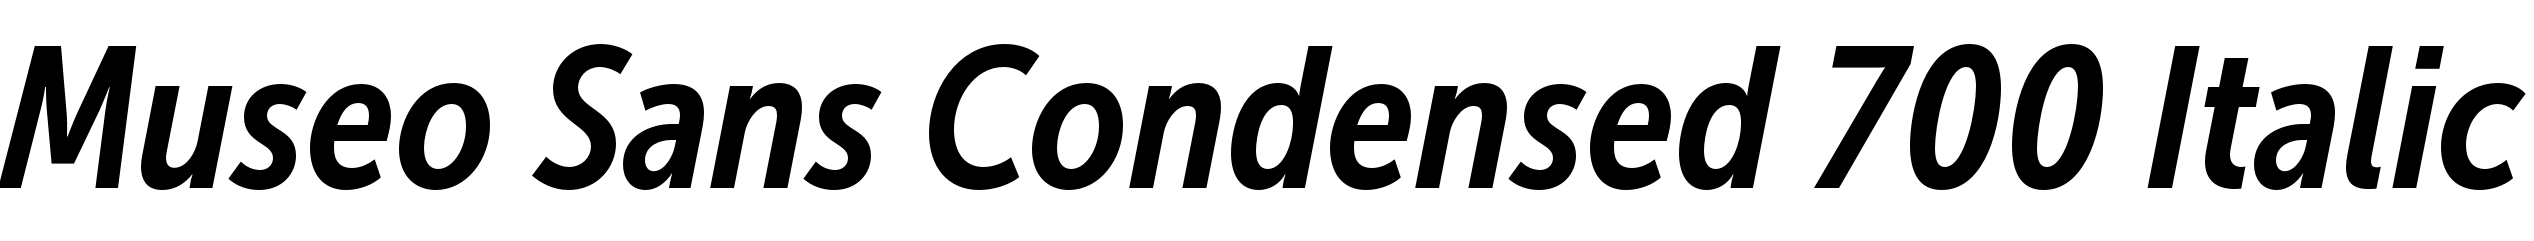 Museo Sans Condensed 700 Italic